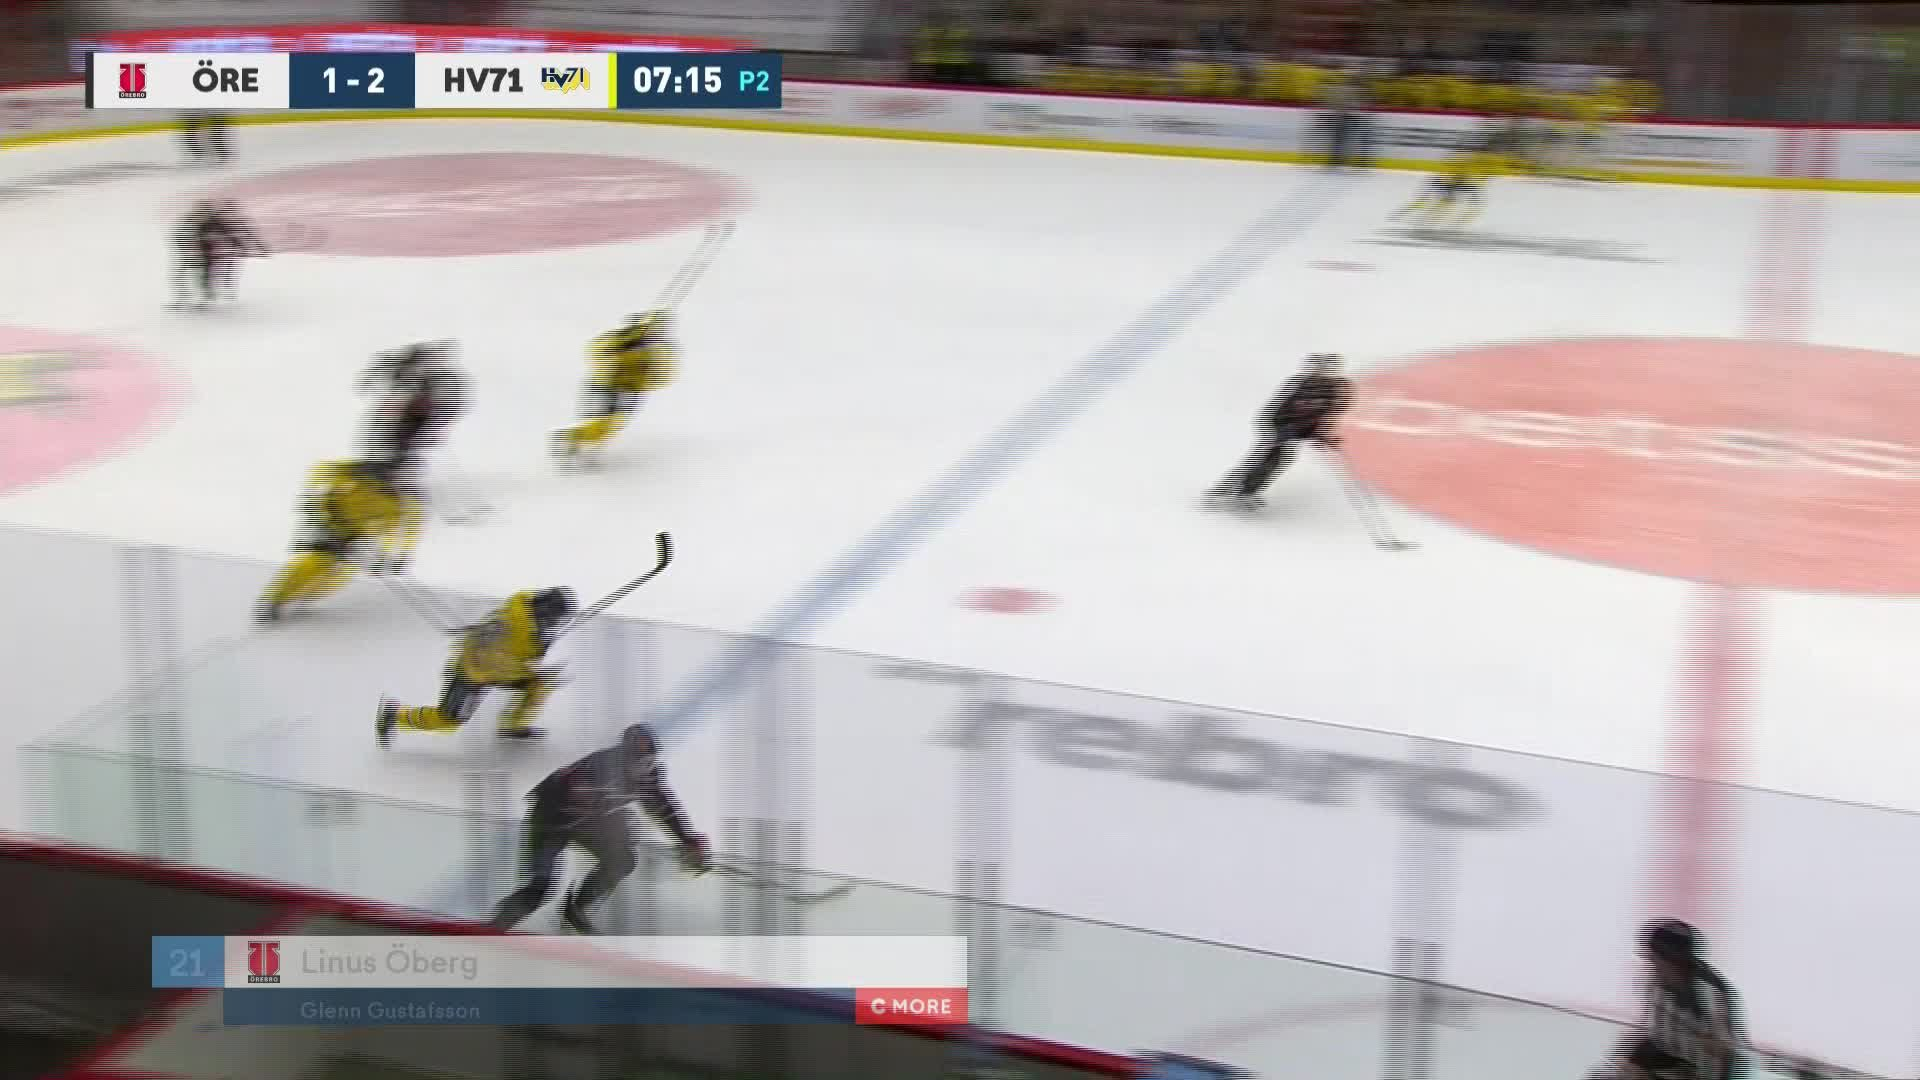 Örebro Hockey - HV71 2-2